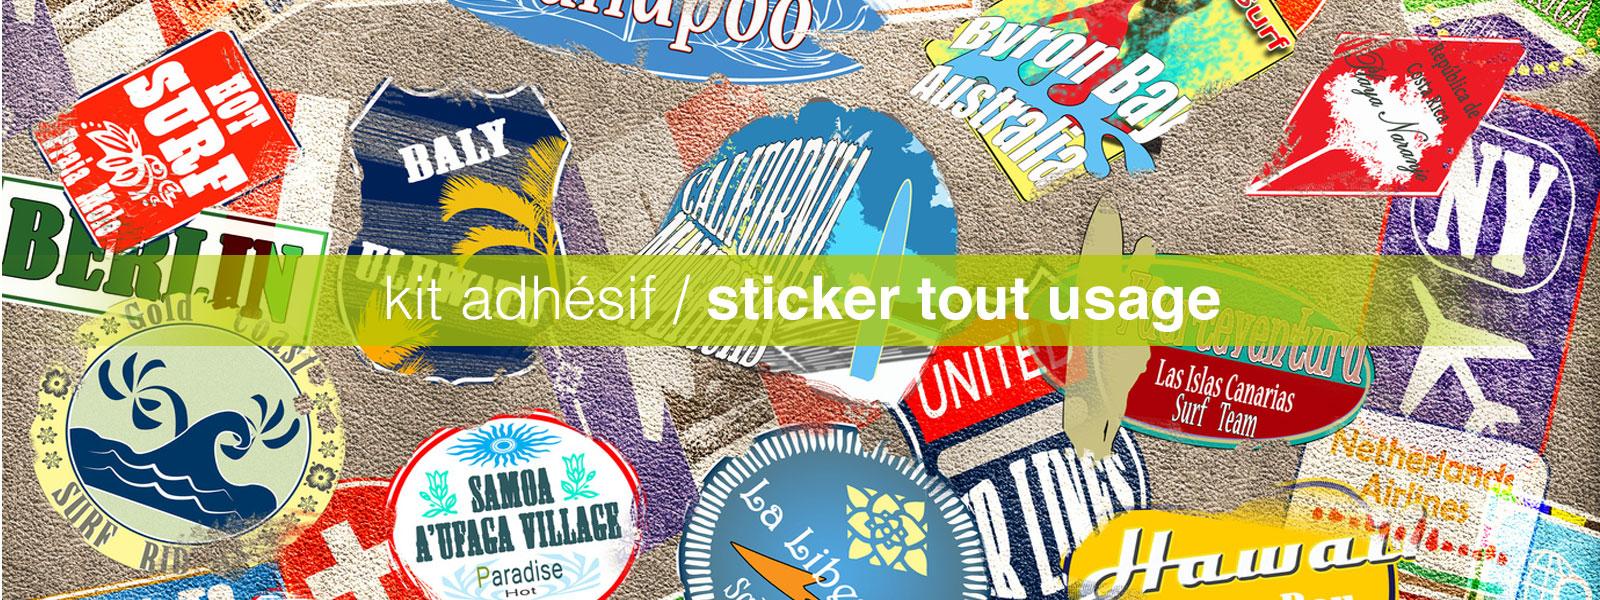 kit adhésif sticker